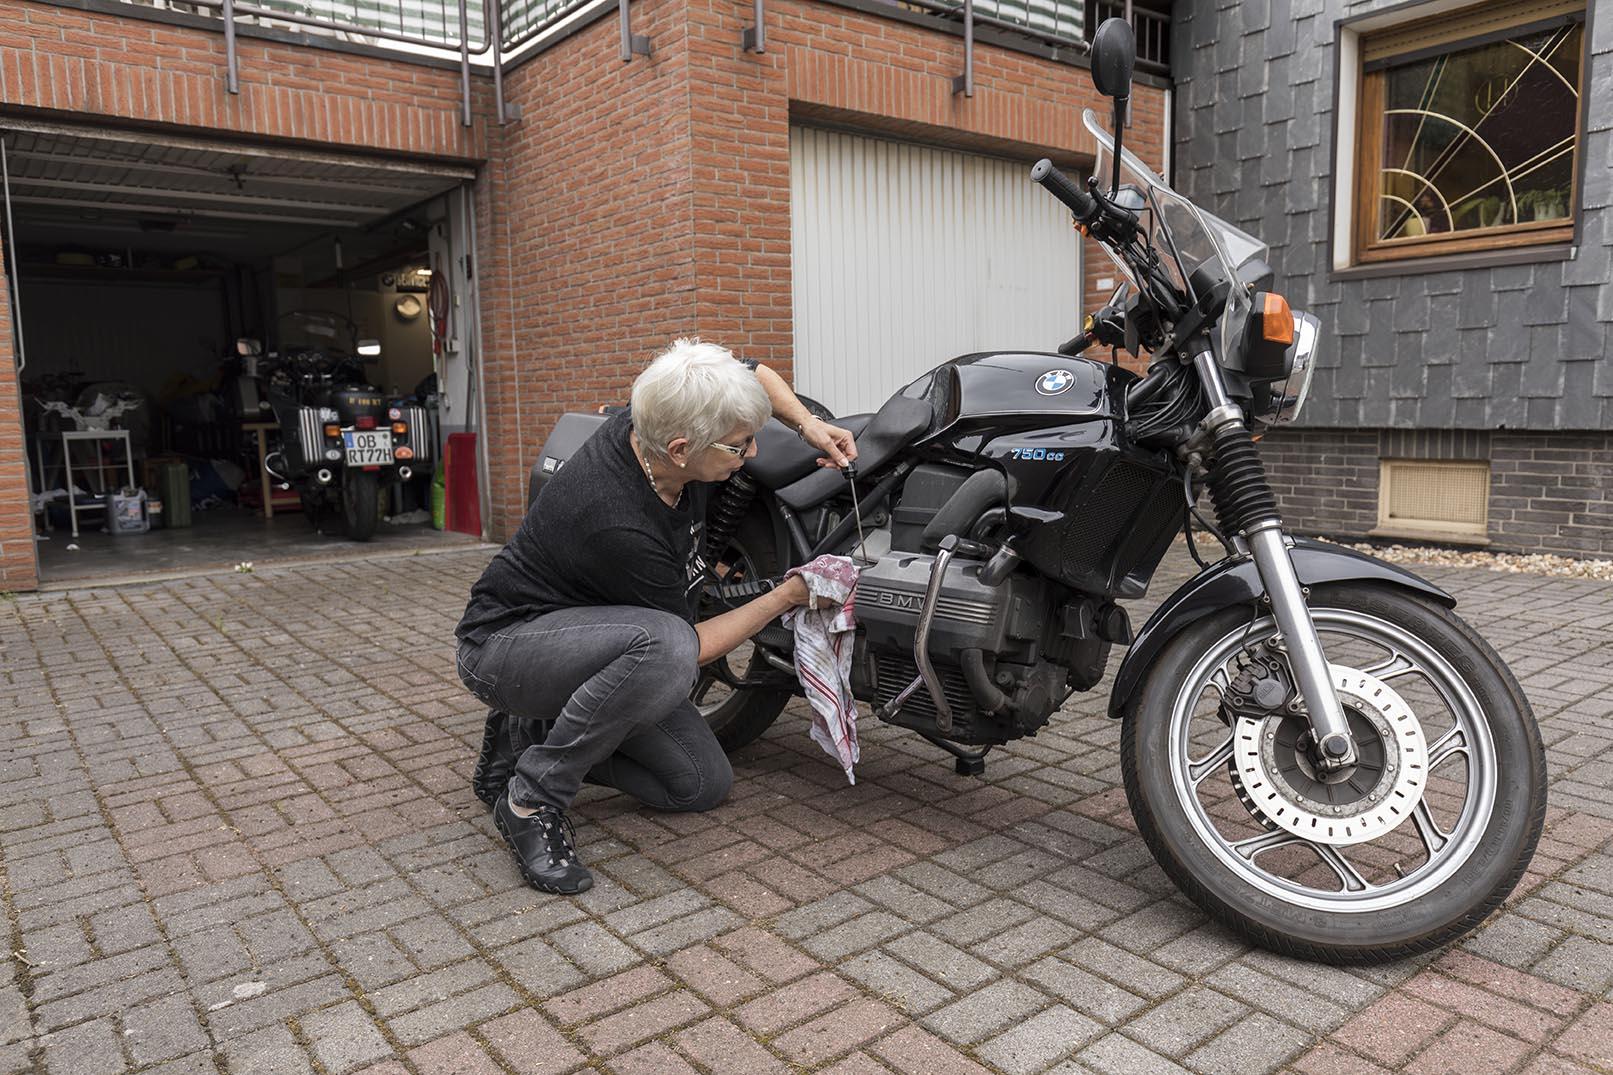 Gisela mit ihrem Motorrad